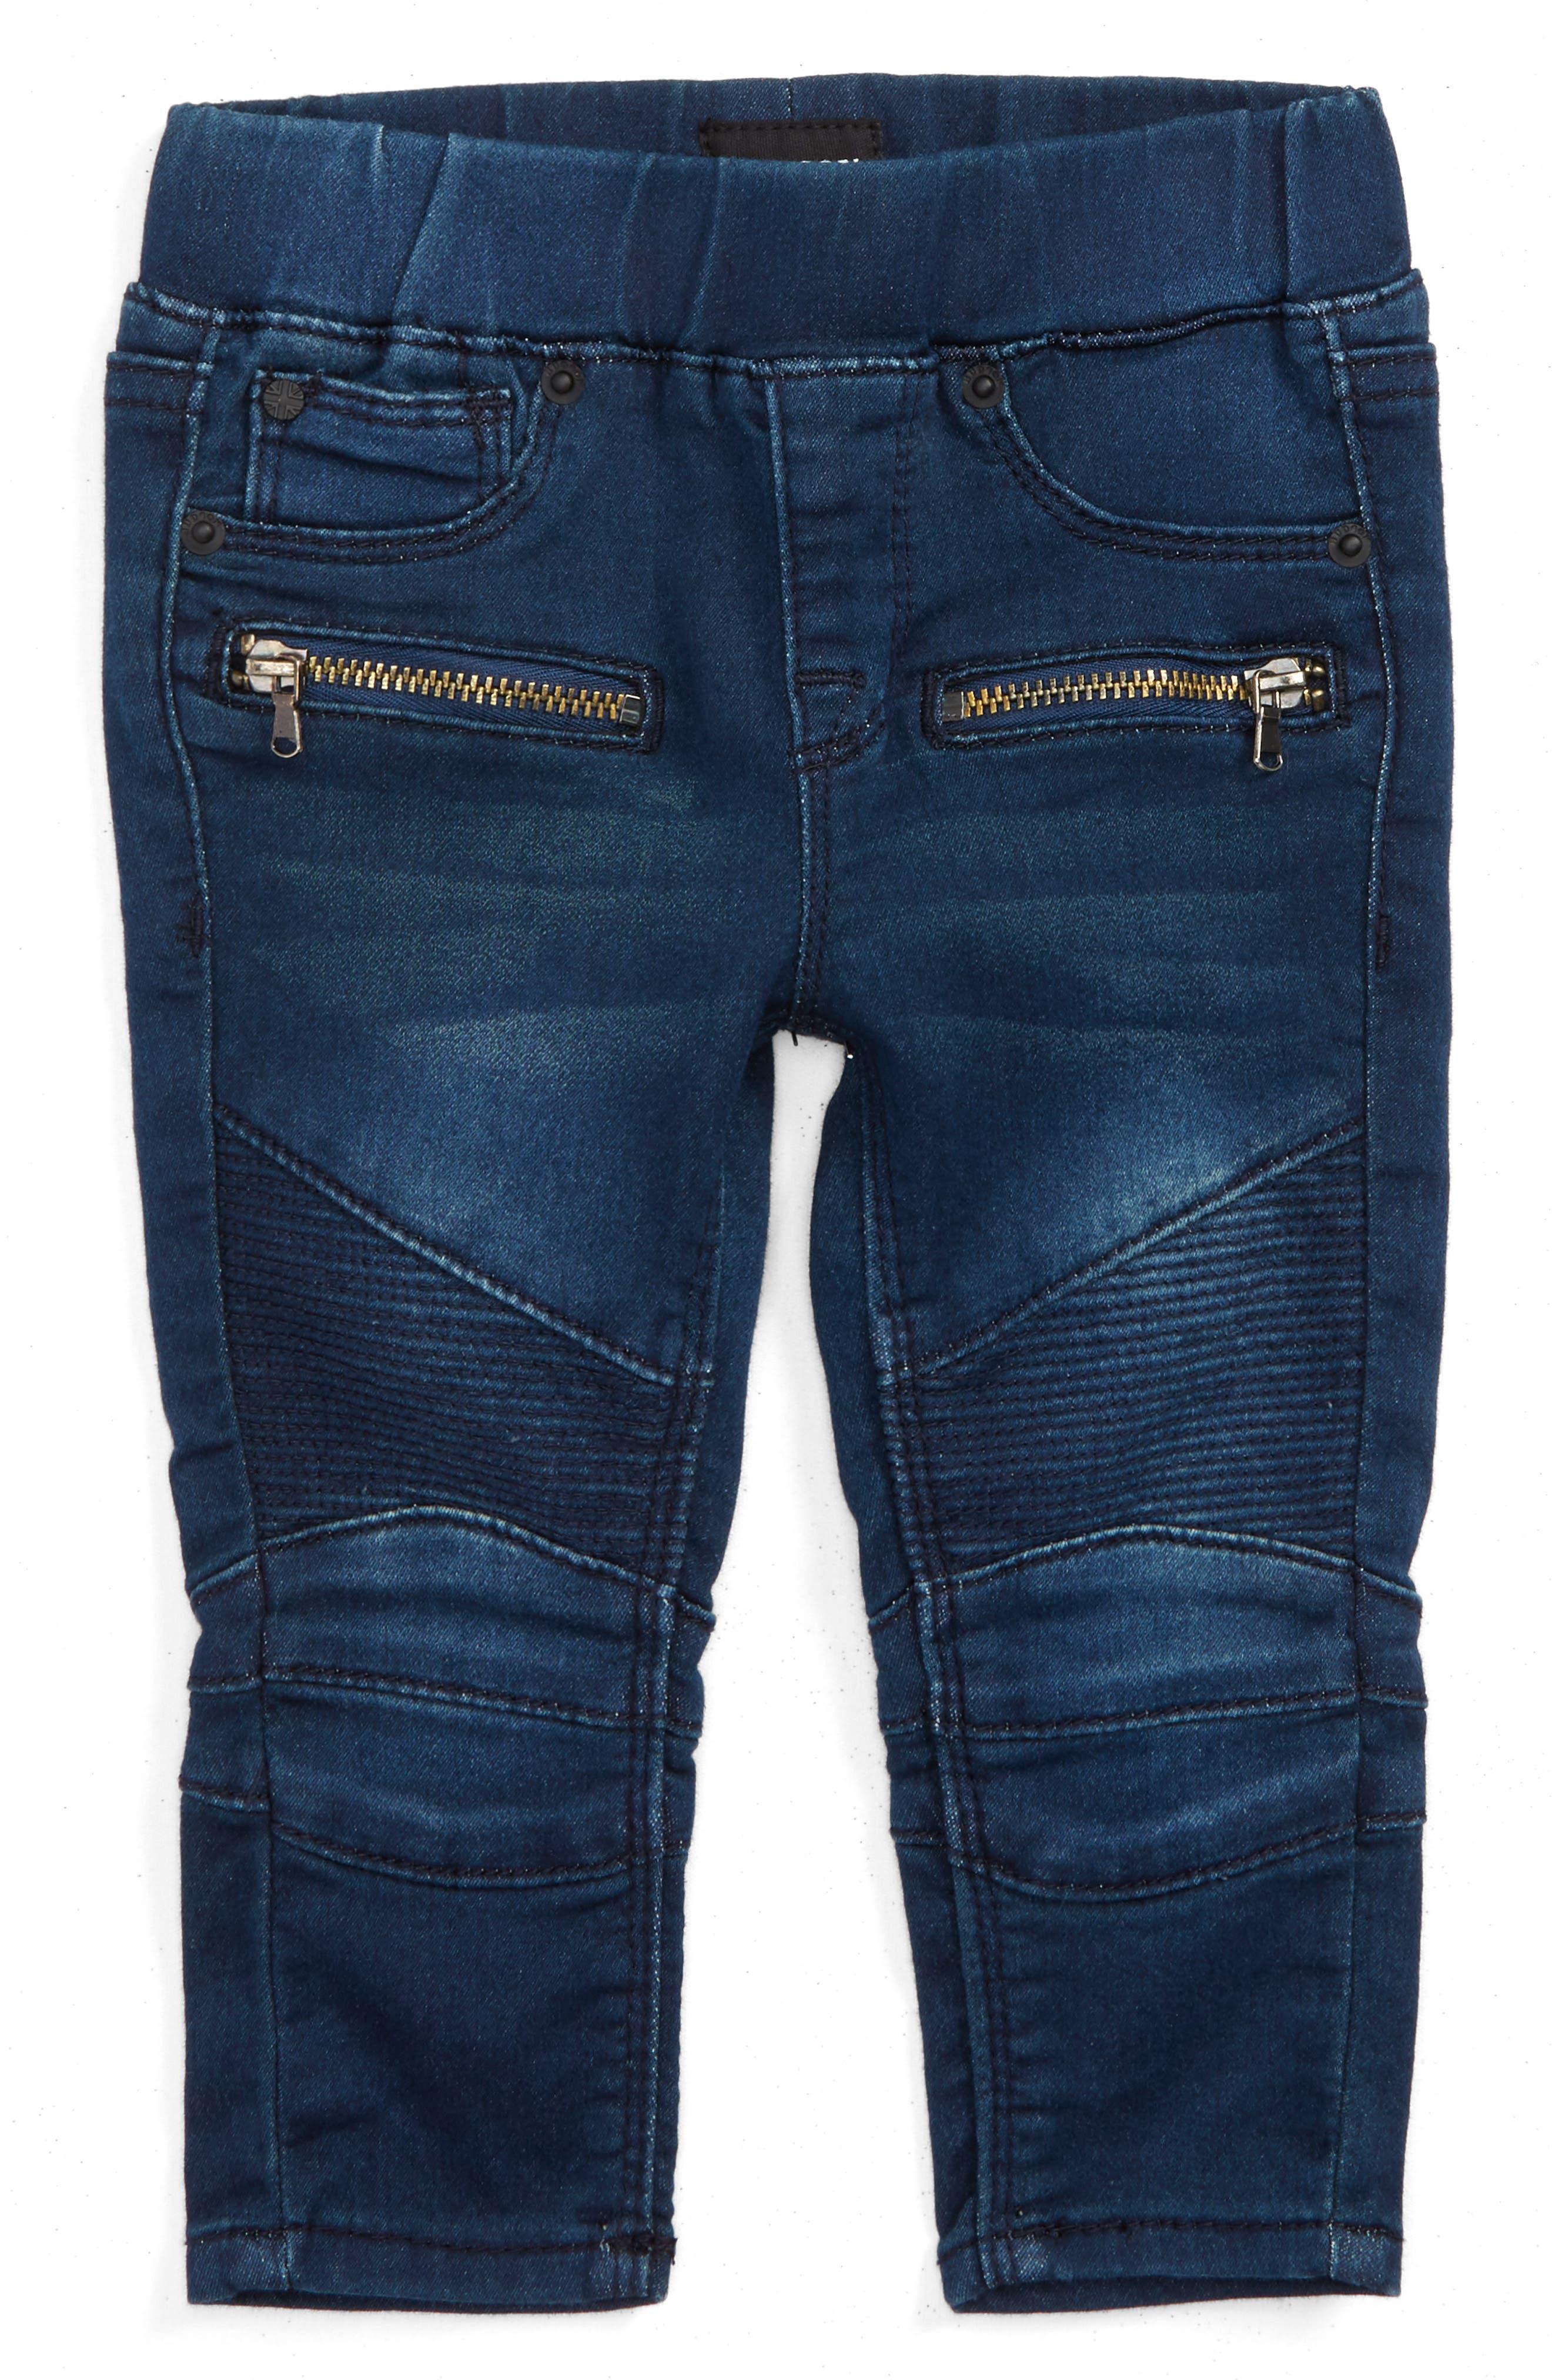 Moto Skinny Jeans,                         Main,                         color, 476